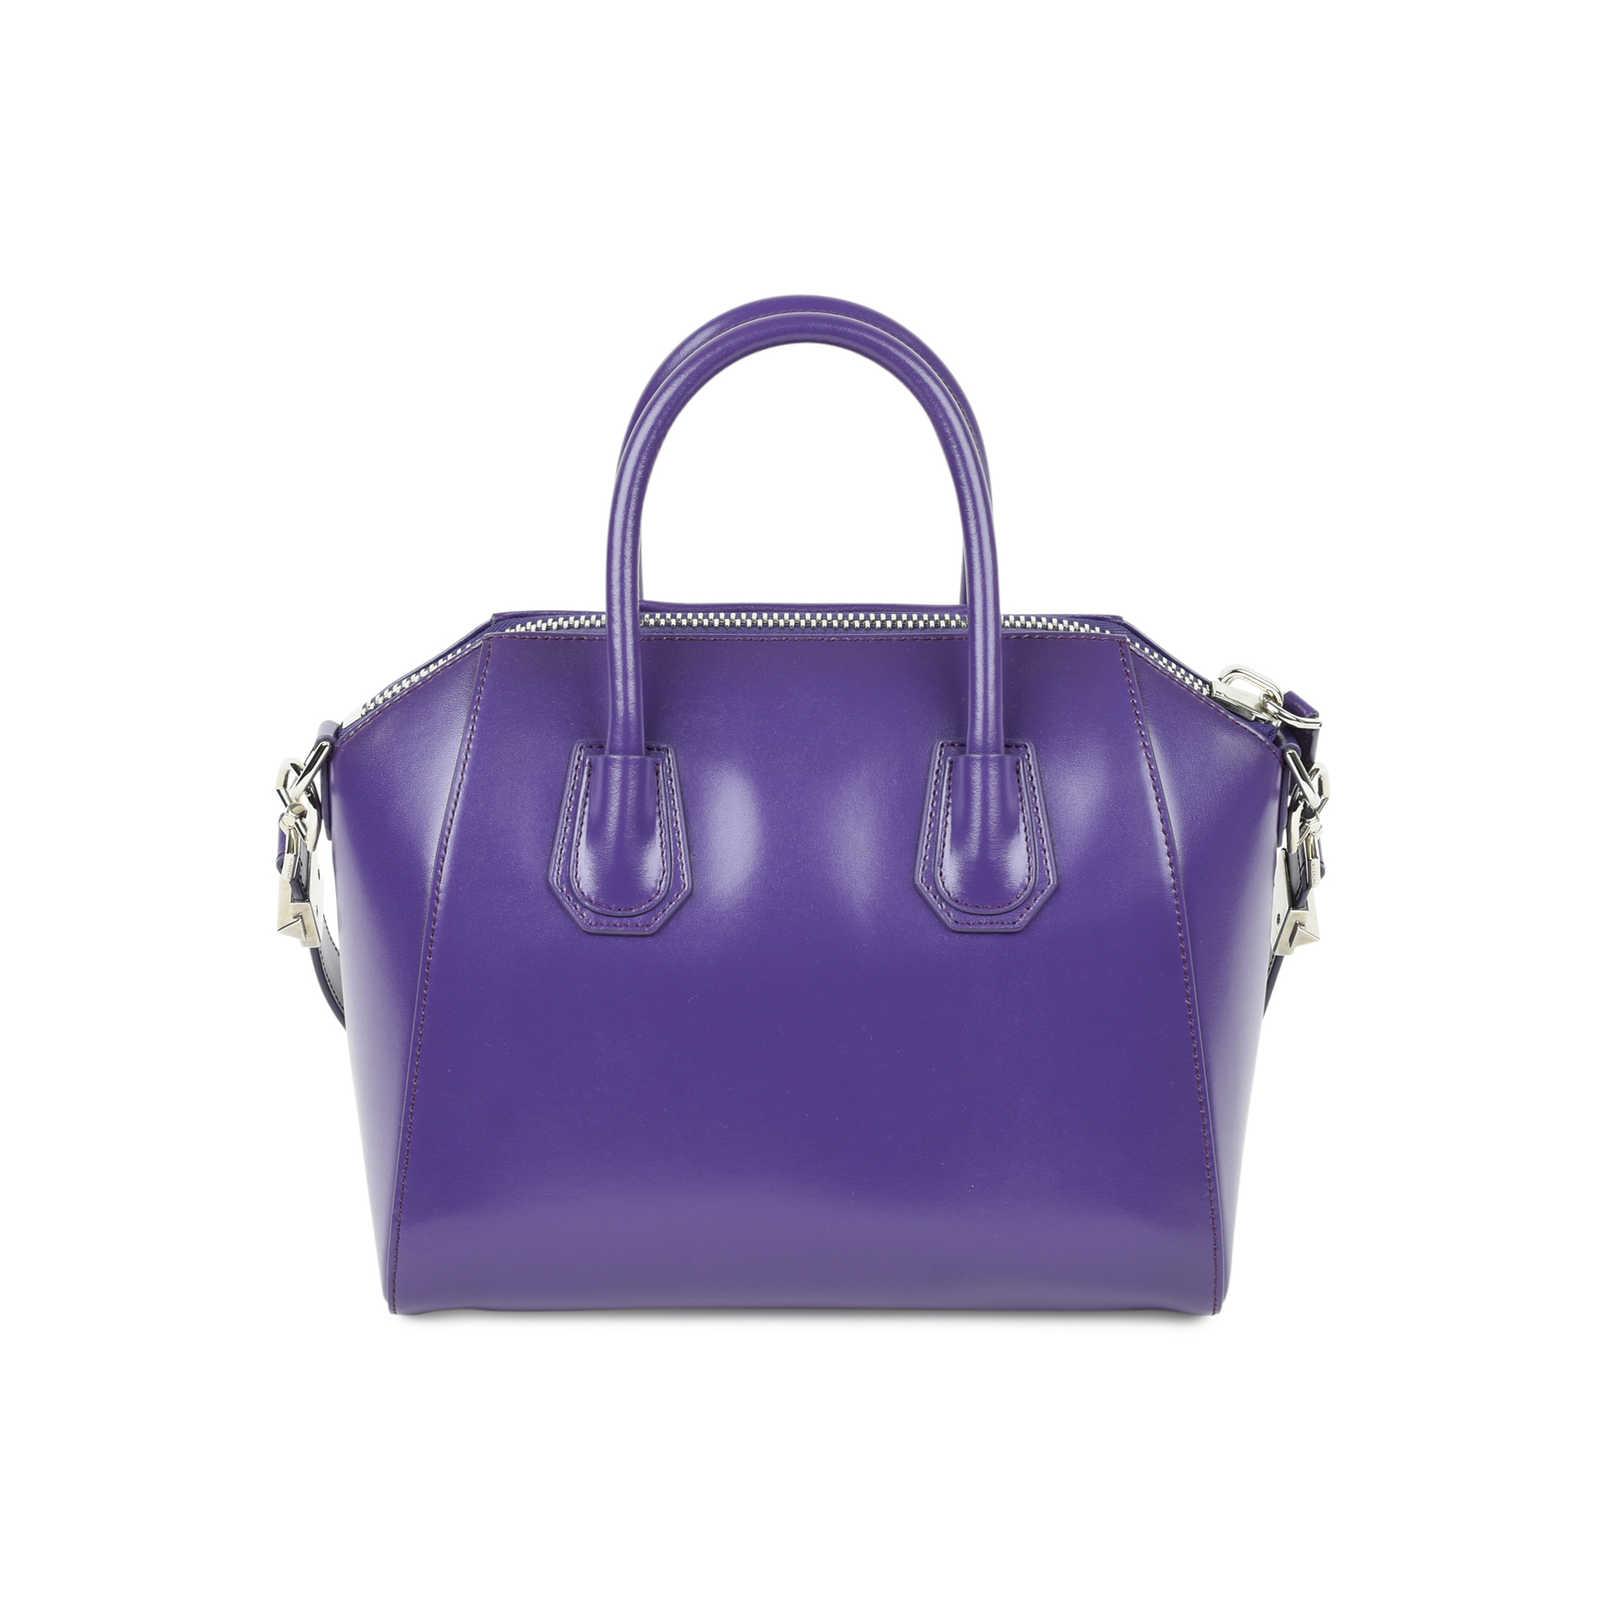 Givenchy Small Antigona Bag Price - Best Model Bag 2018 8b65b18c4ca53